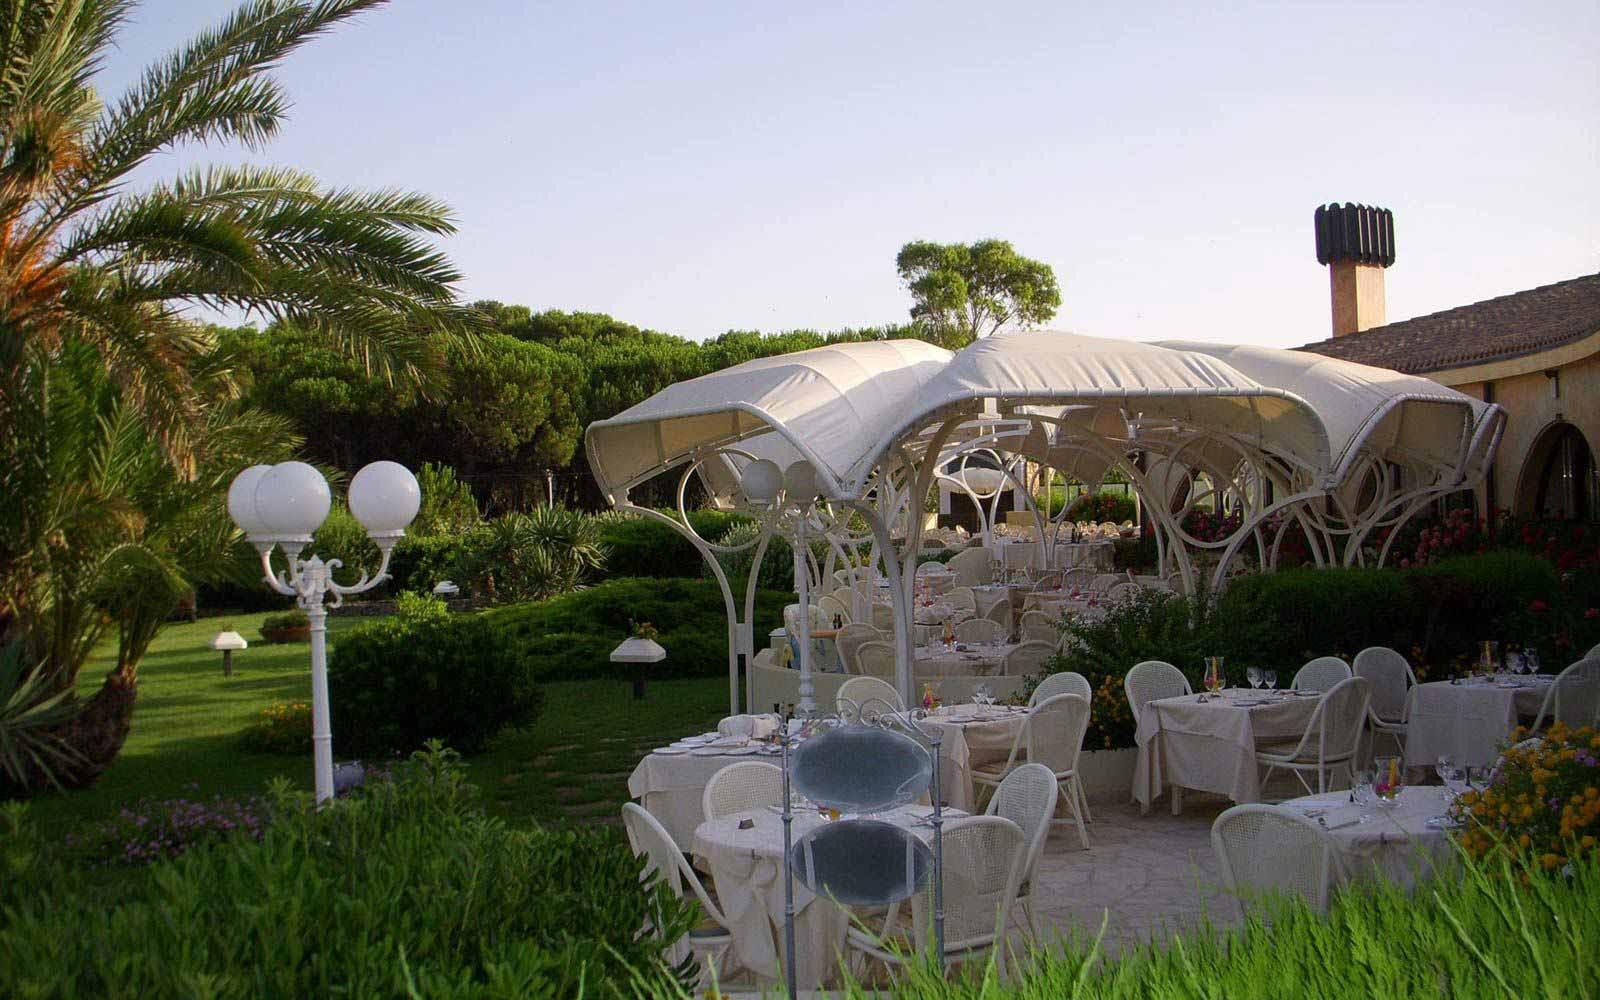 Outdoor dining at Hotel Baia Di Nora